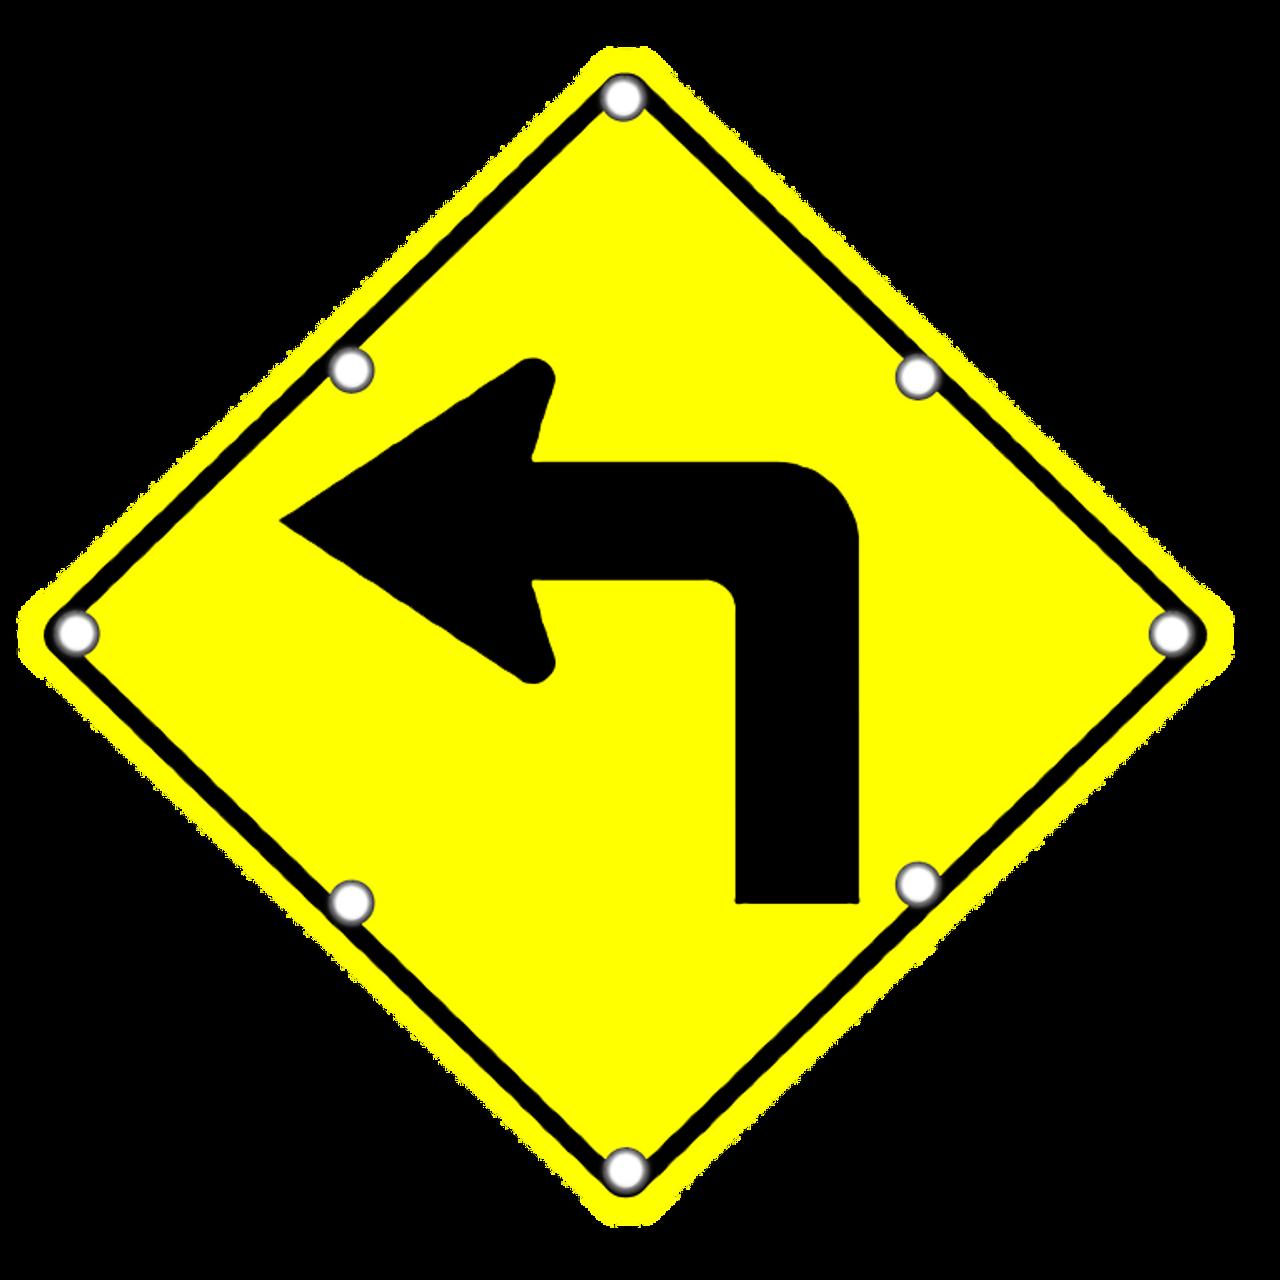 Flashing Led W1 1l Left Turn Dornbos Sign Safety Inc